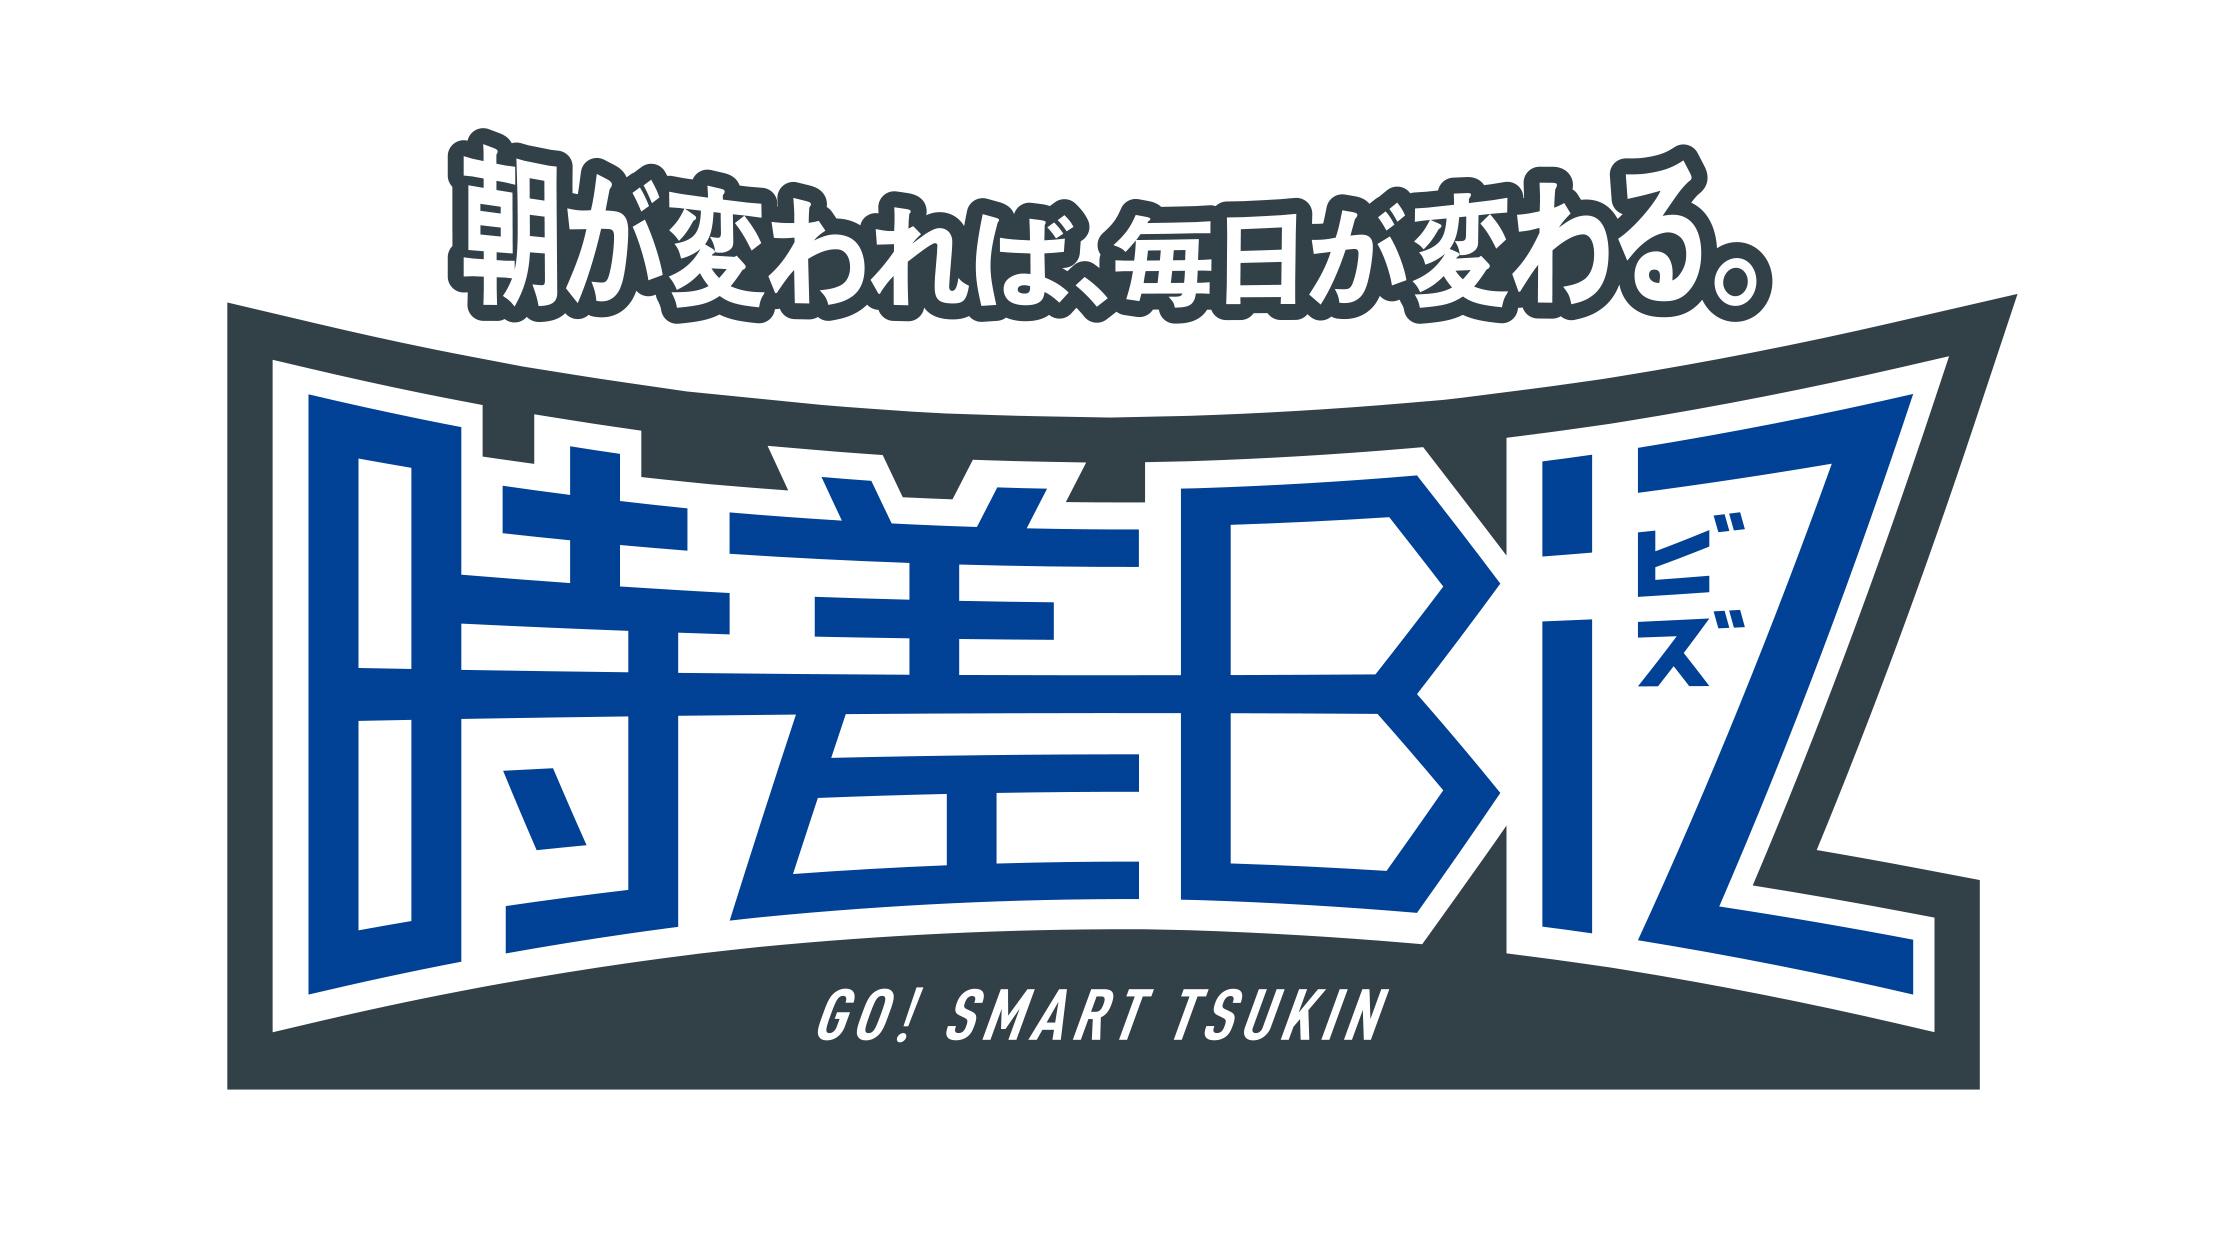 jisabiz_logo_03